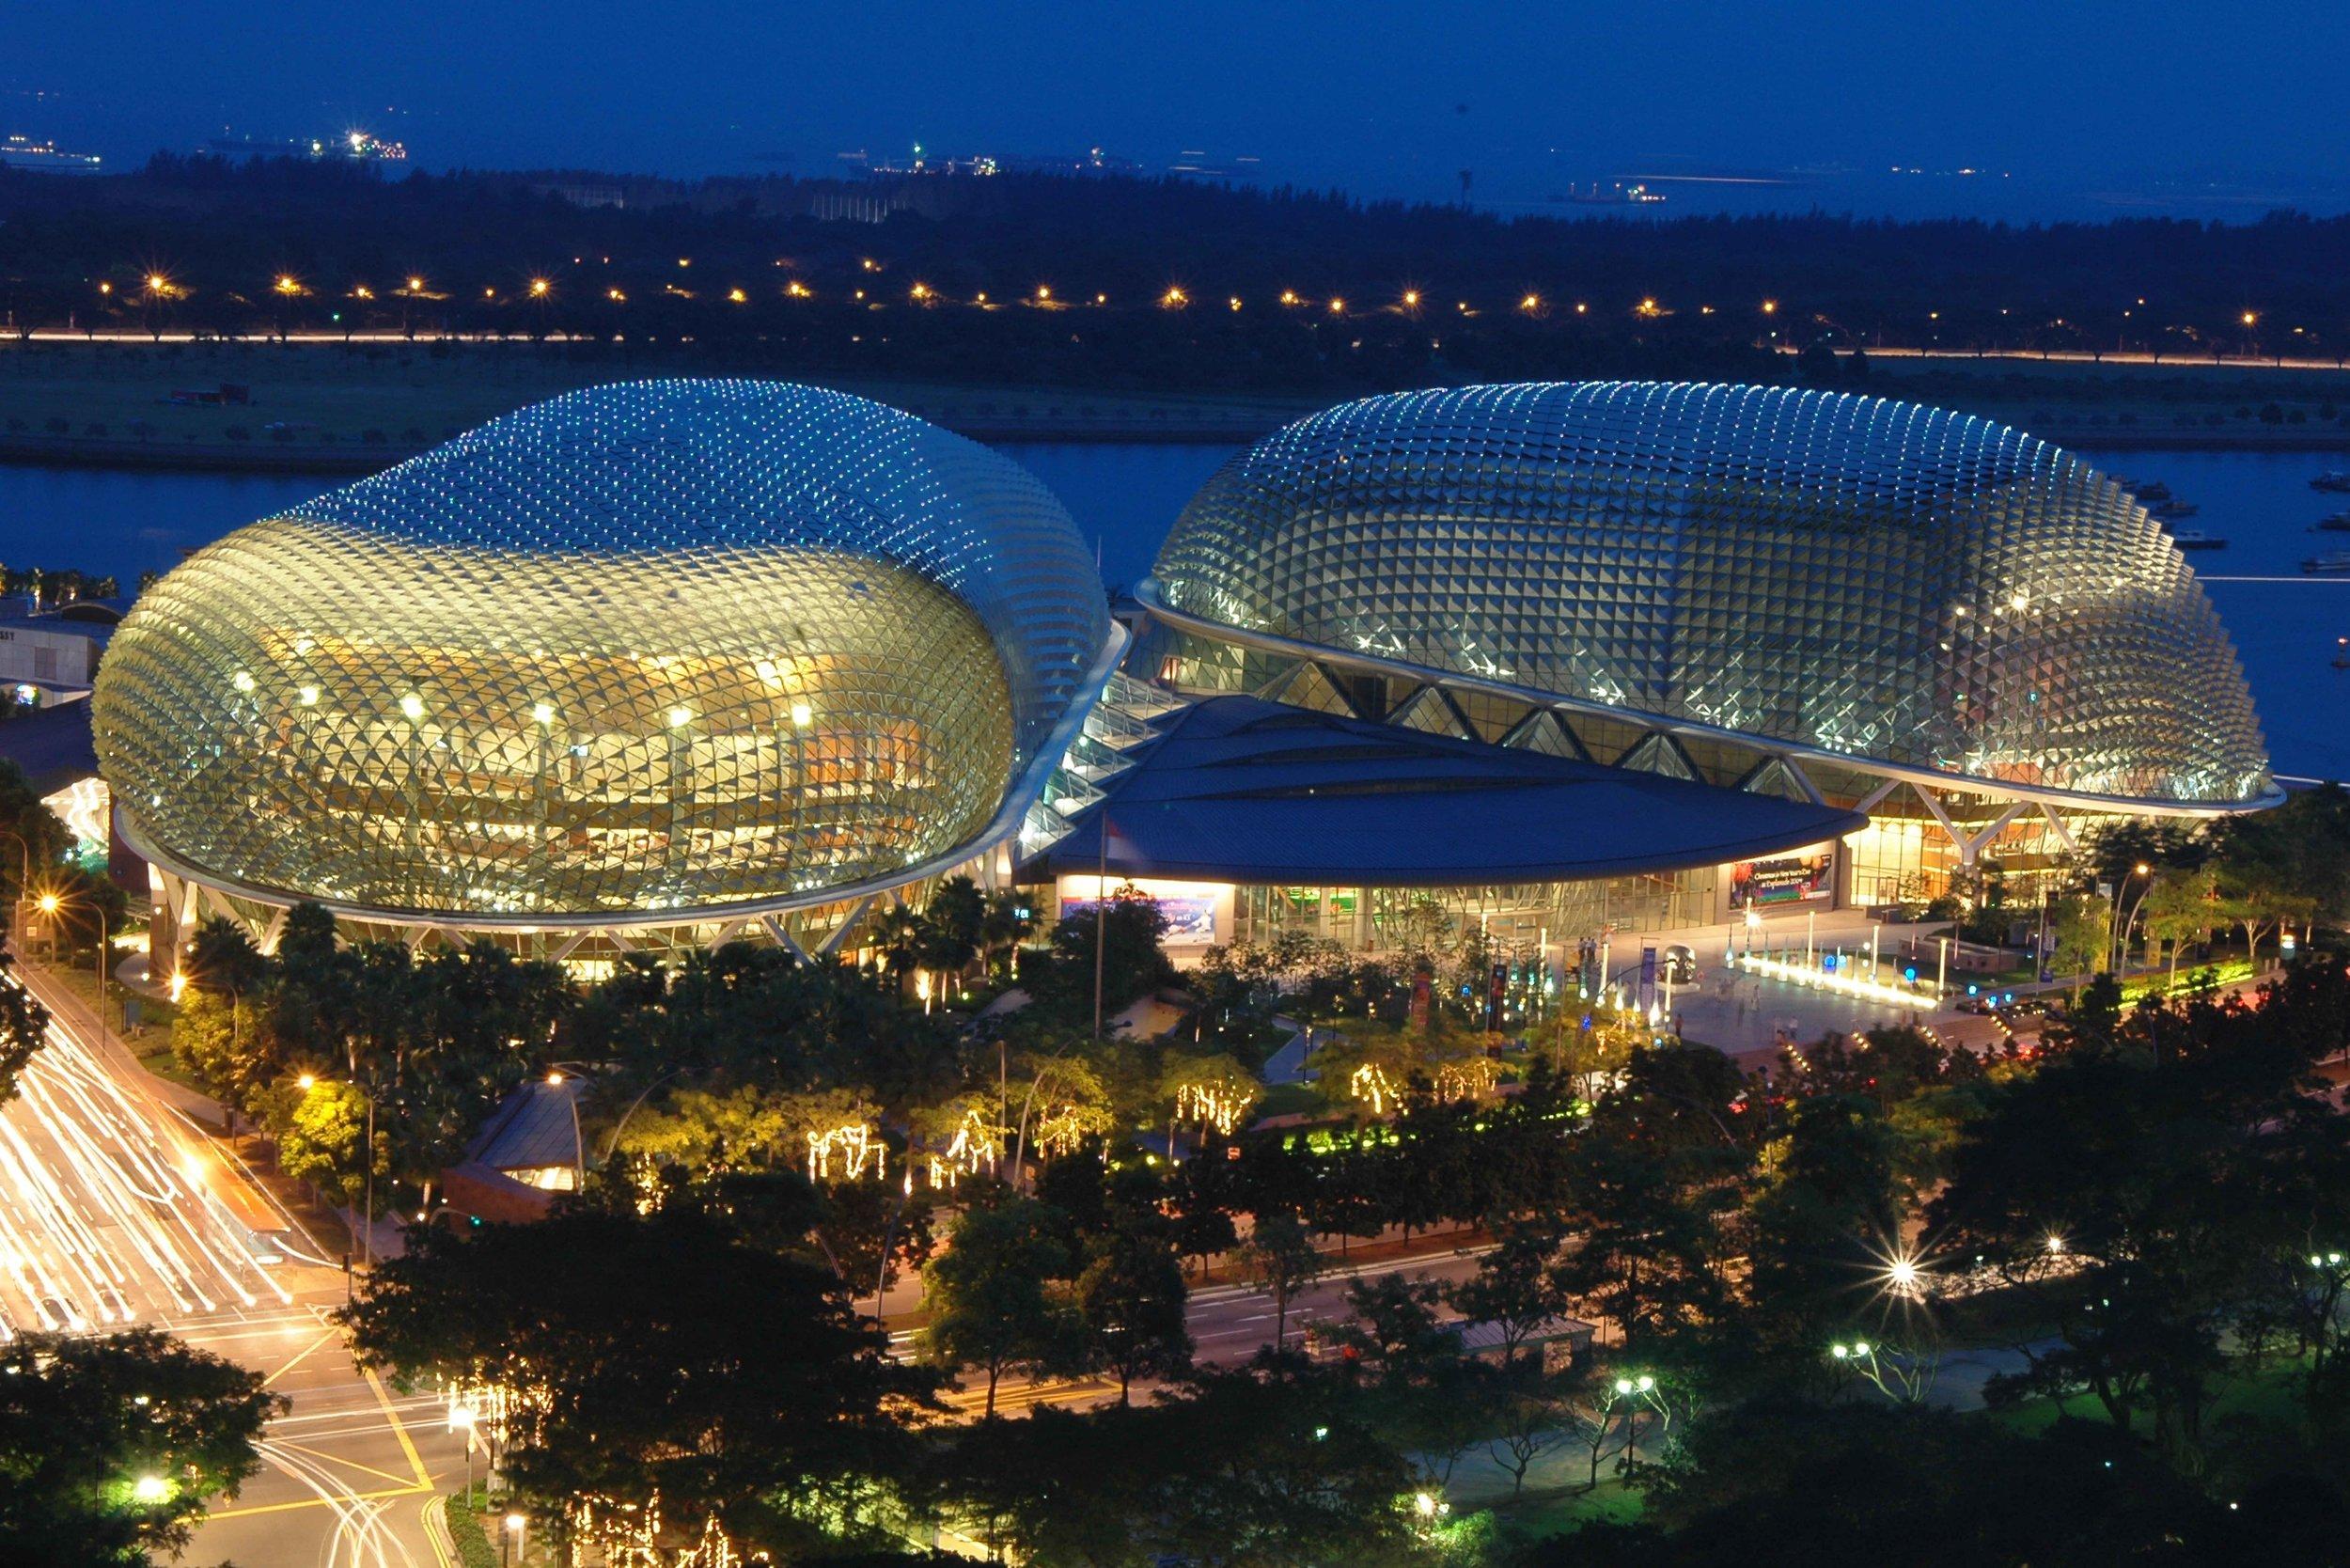 6: Esplanade Theatres - One of world's busiest art centres